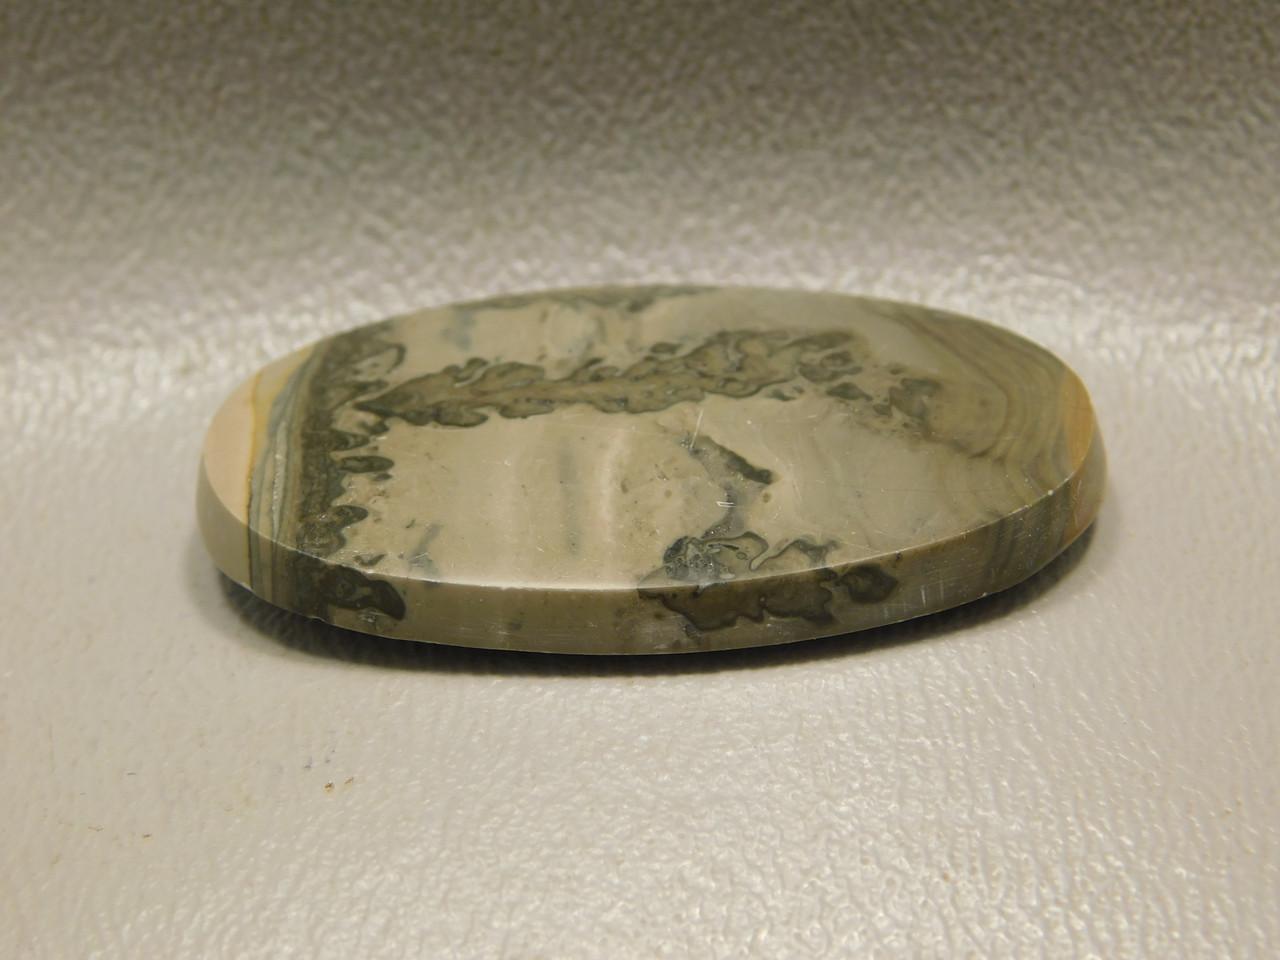 Cotham Marble Fossil Stromatolite Stone Cabochon England #11